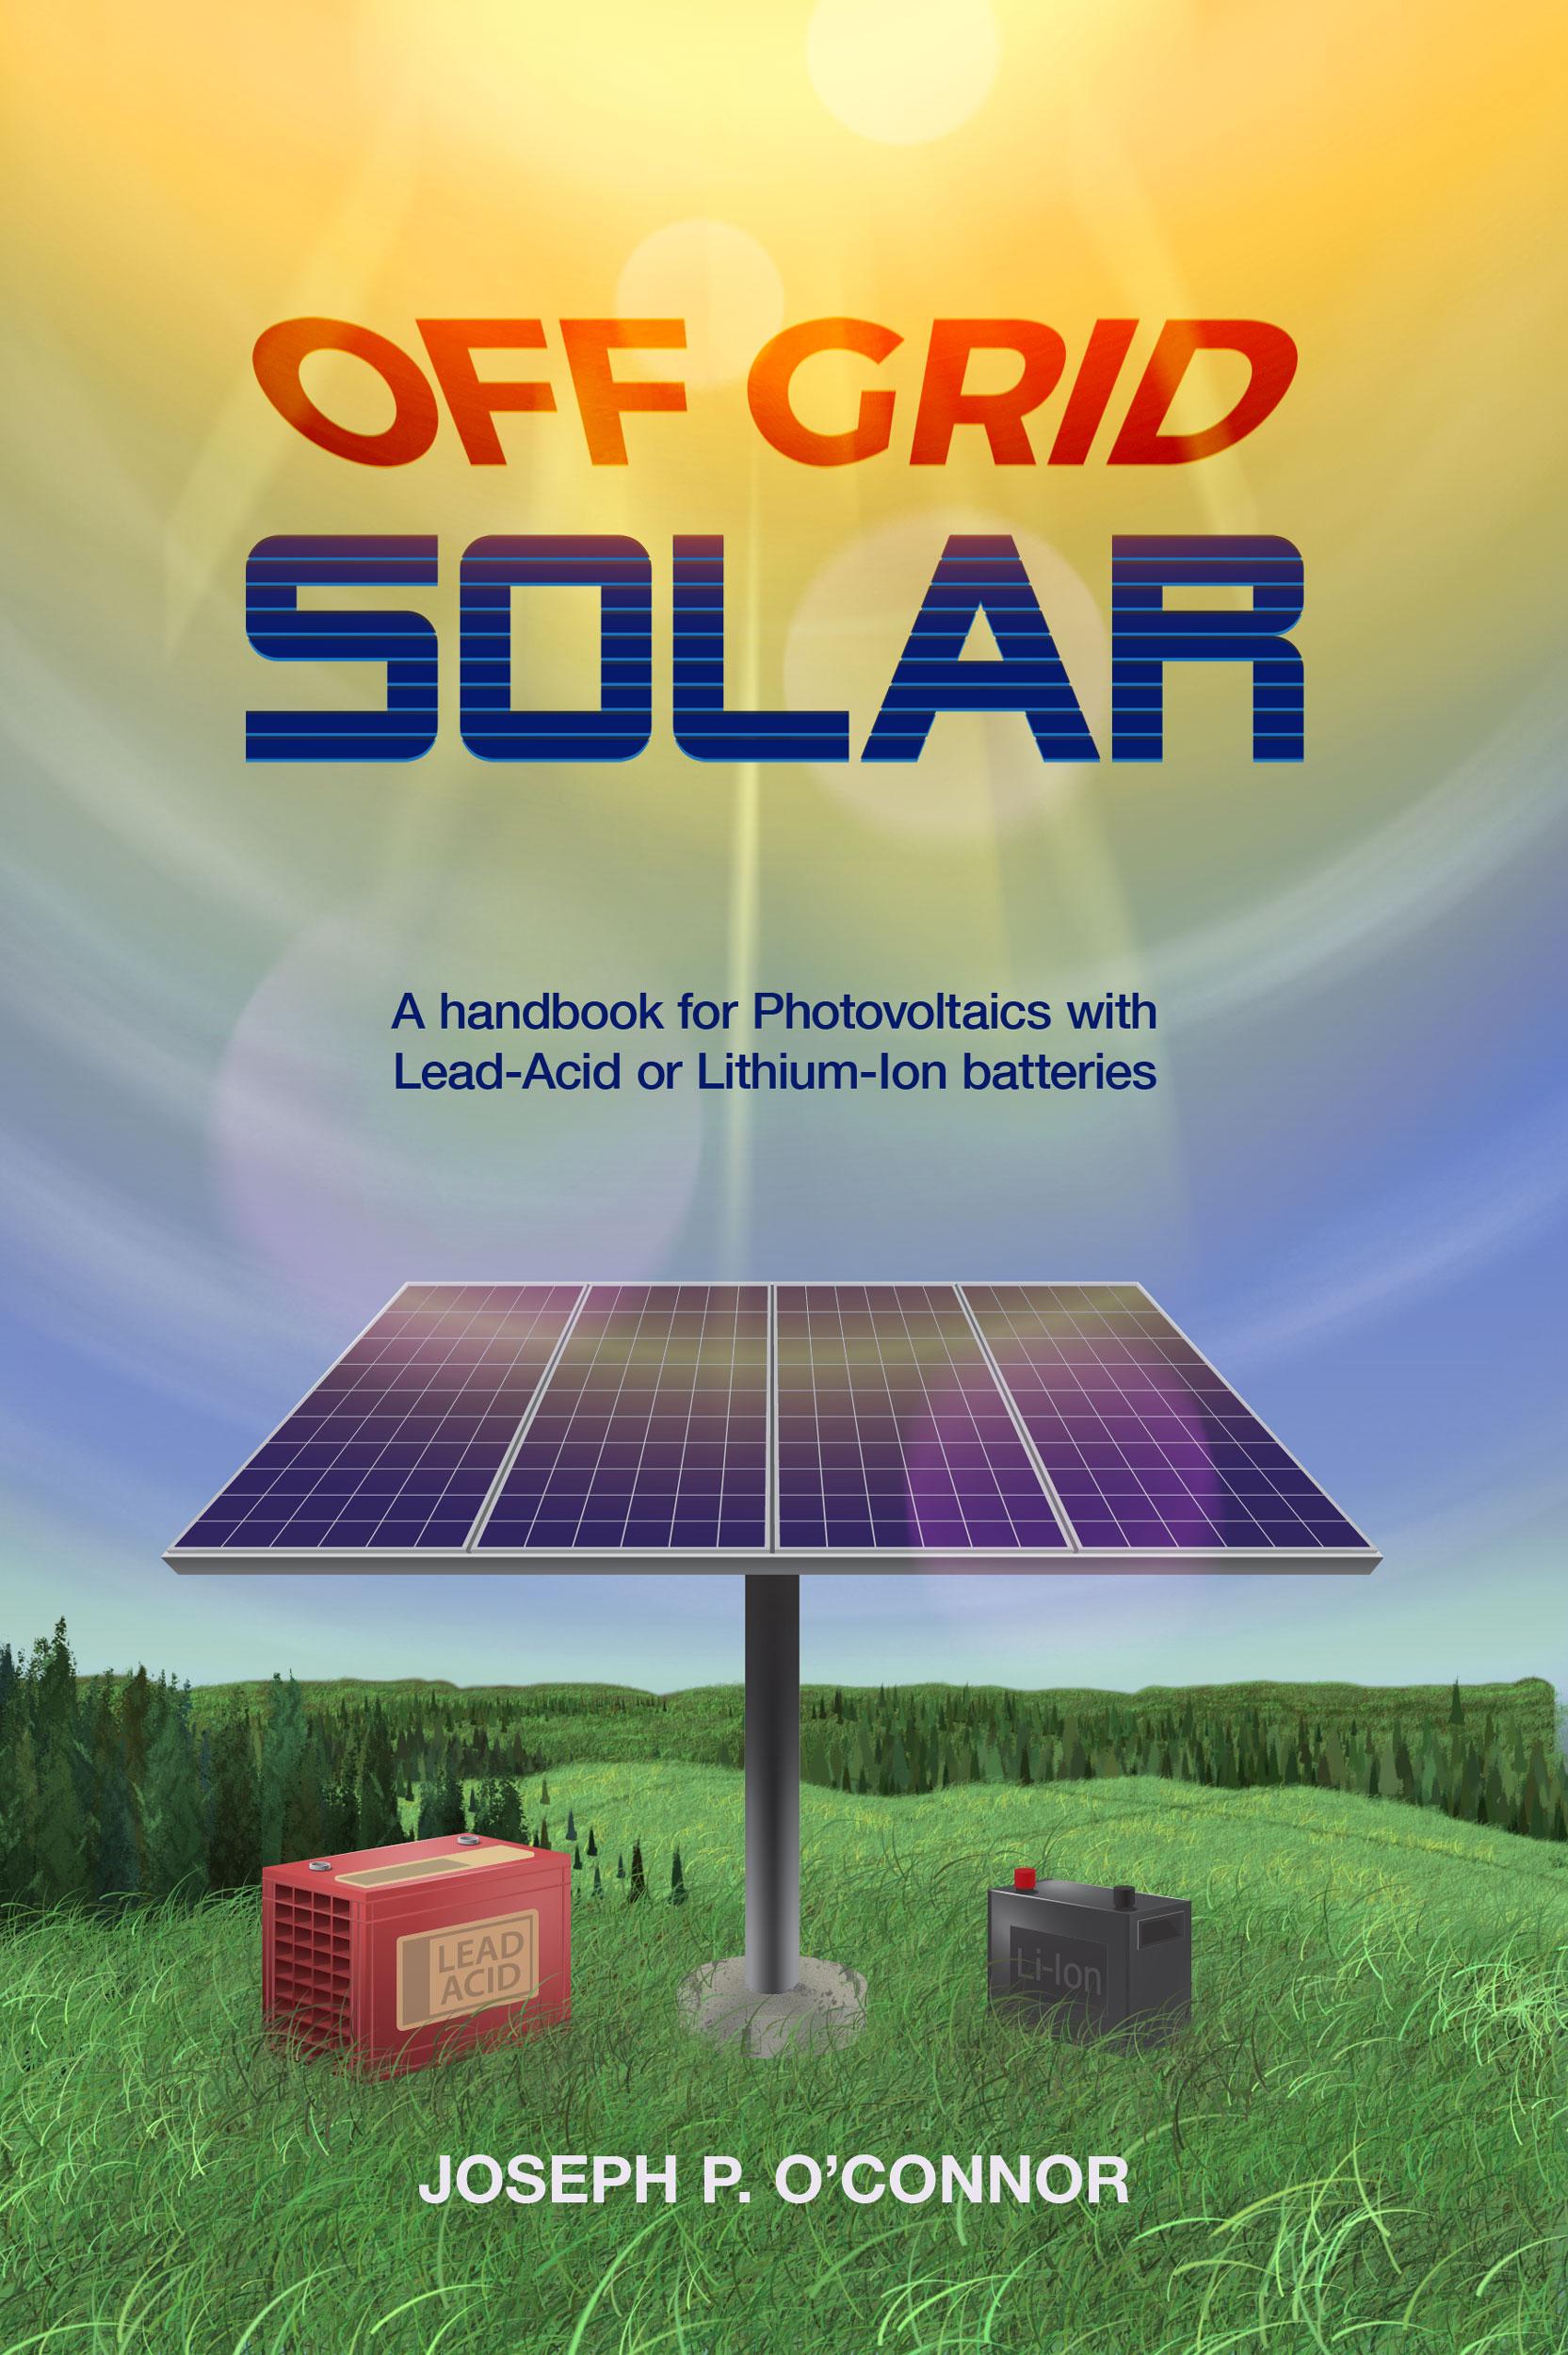 Off Grid Solar Book